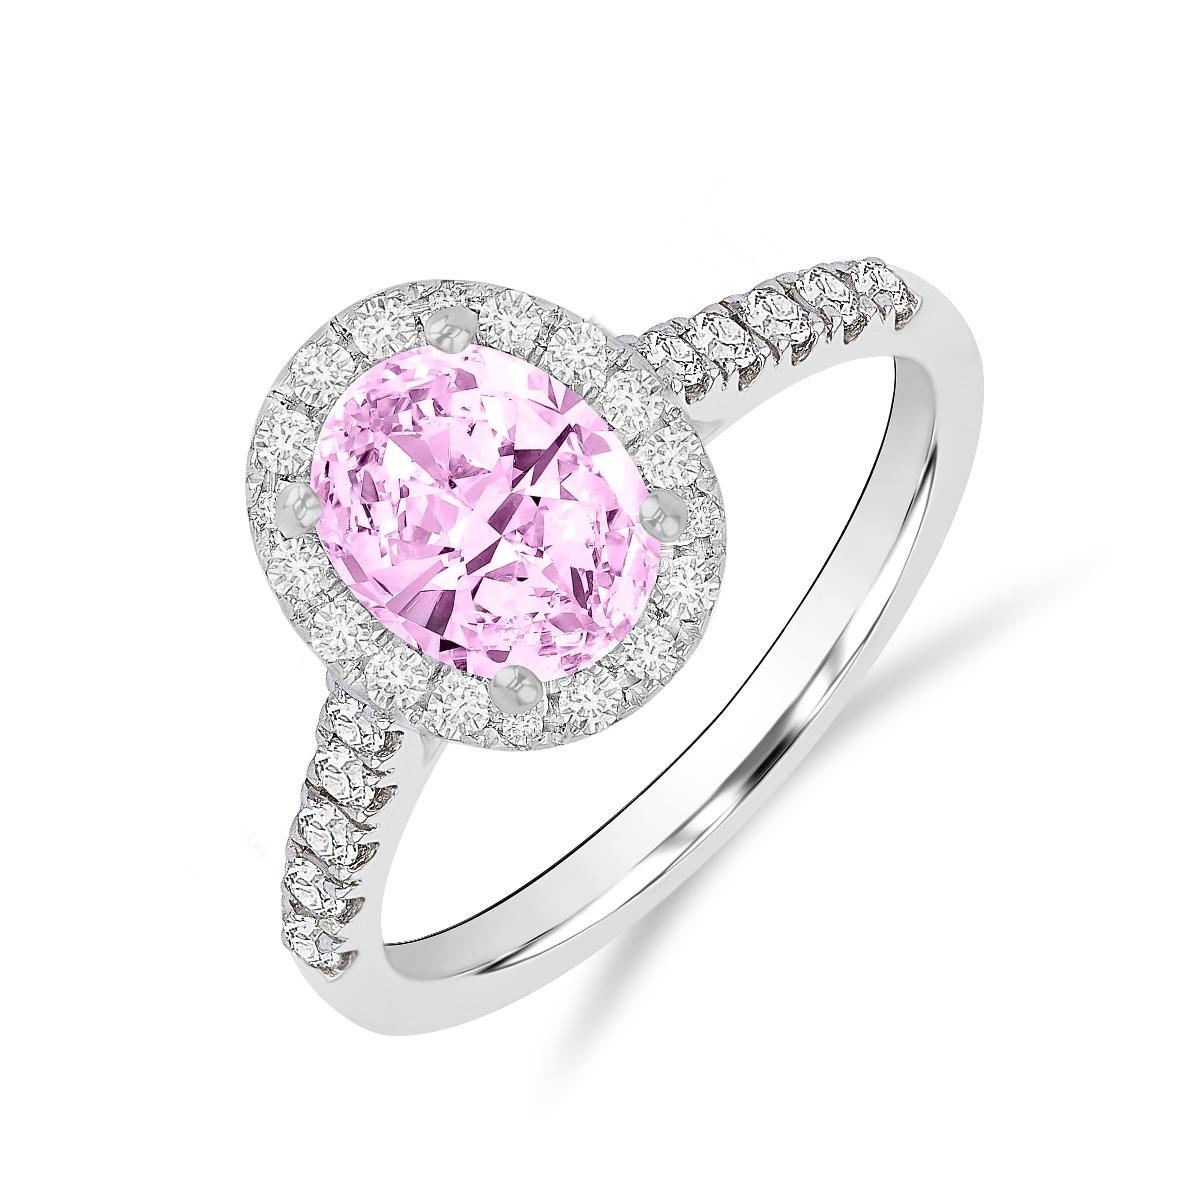 Riviera collection 1.25ct Oval Morganite & Diamond Ring | 18K White Gold